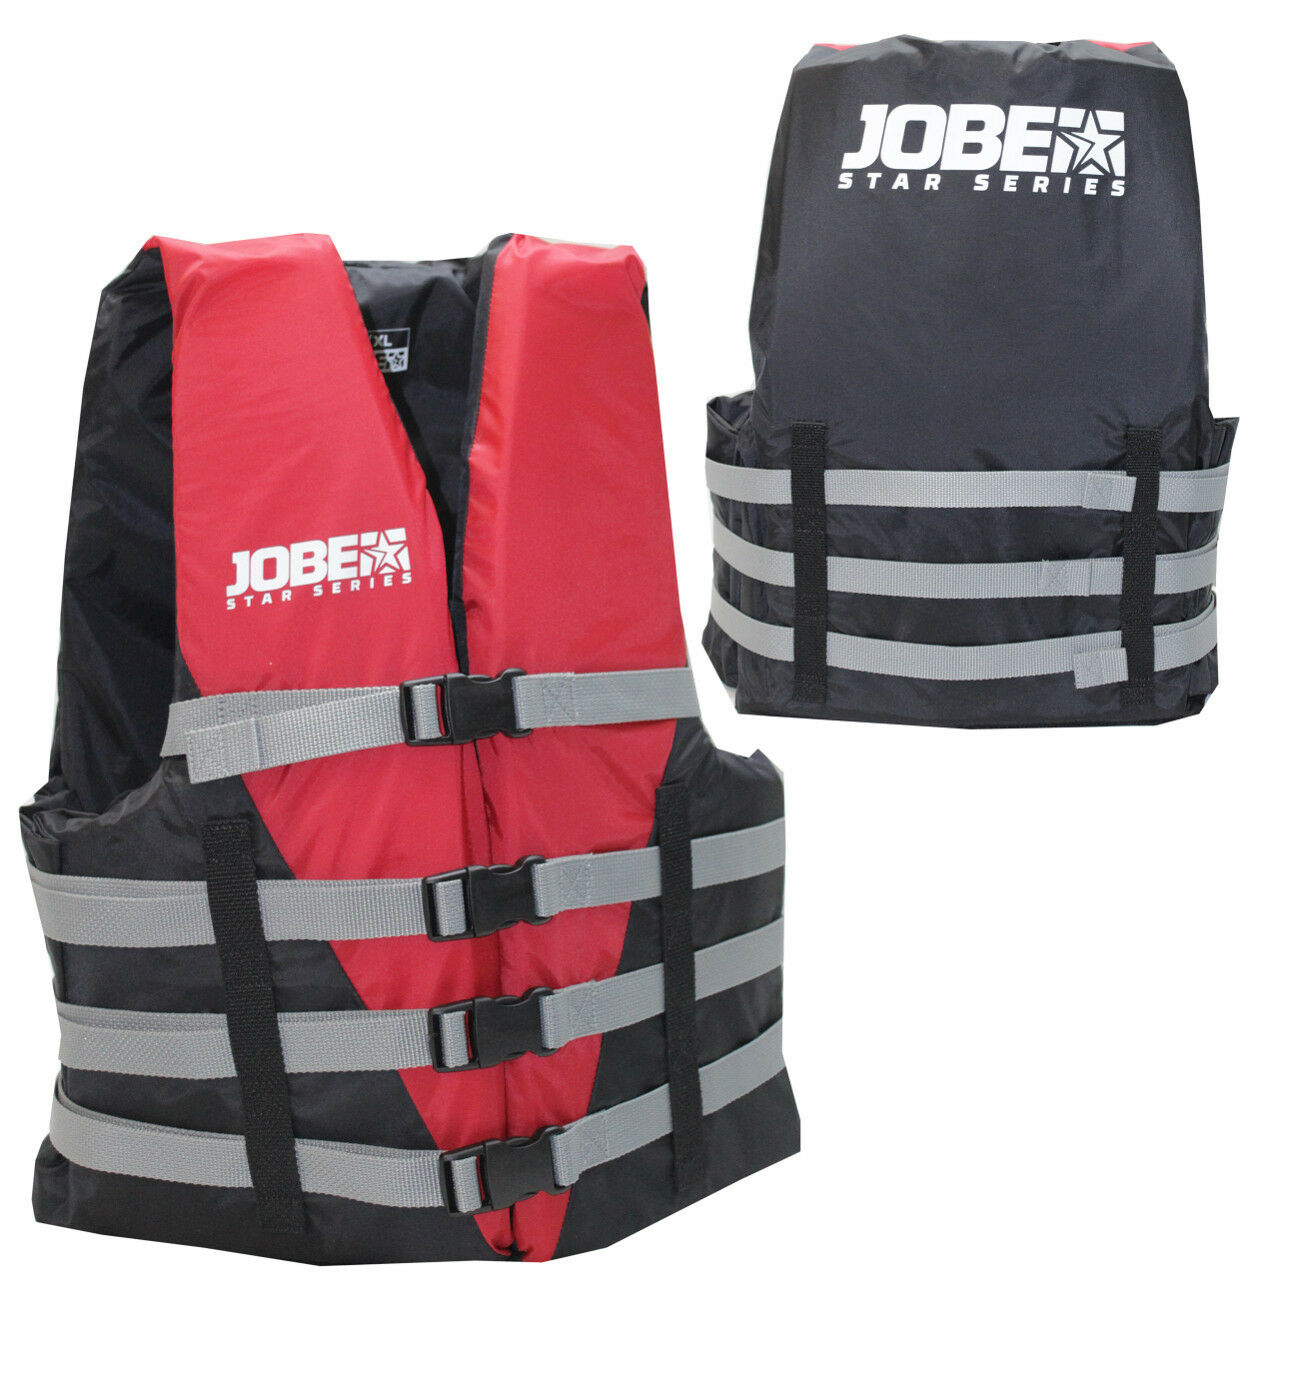 Jobe Pointer Vest Star L/XL Schwimmweste Stiefele Stiefelweste Kajak Weste Stiefelweste Stiefele S-N 2de36e